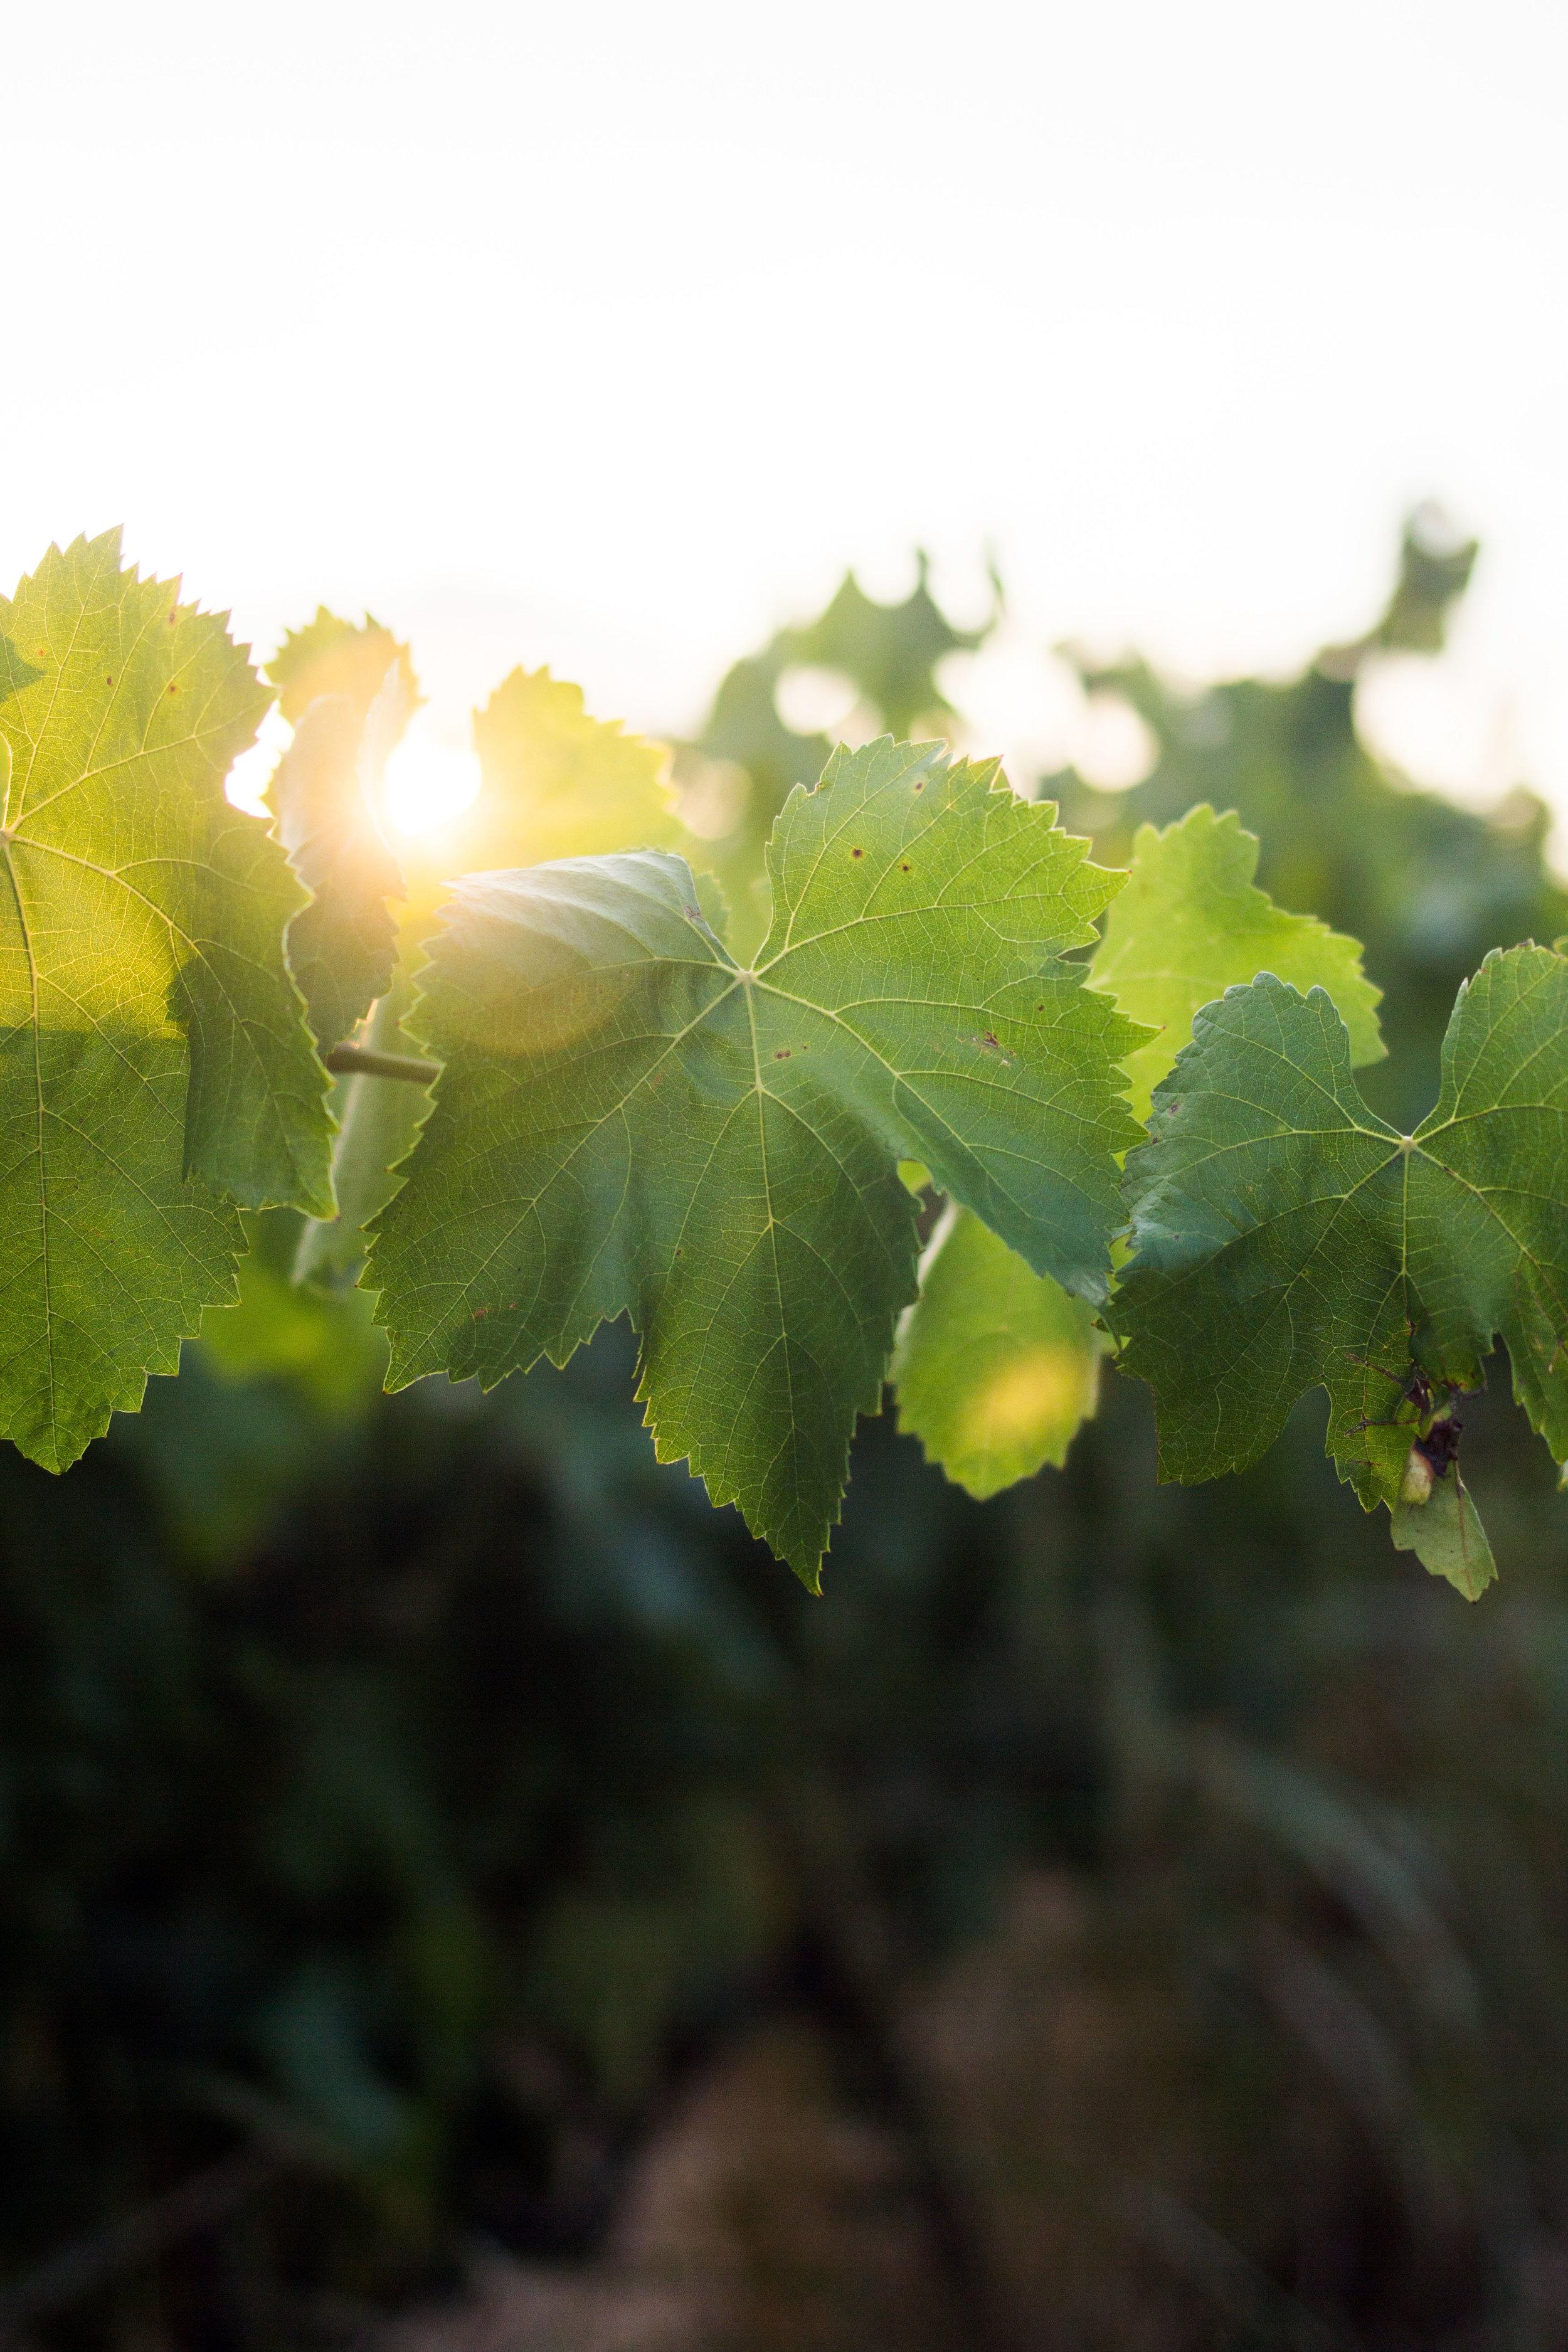 Sun shining through vine leaves